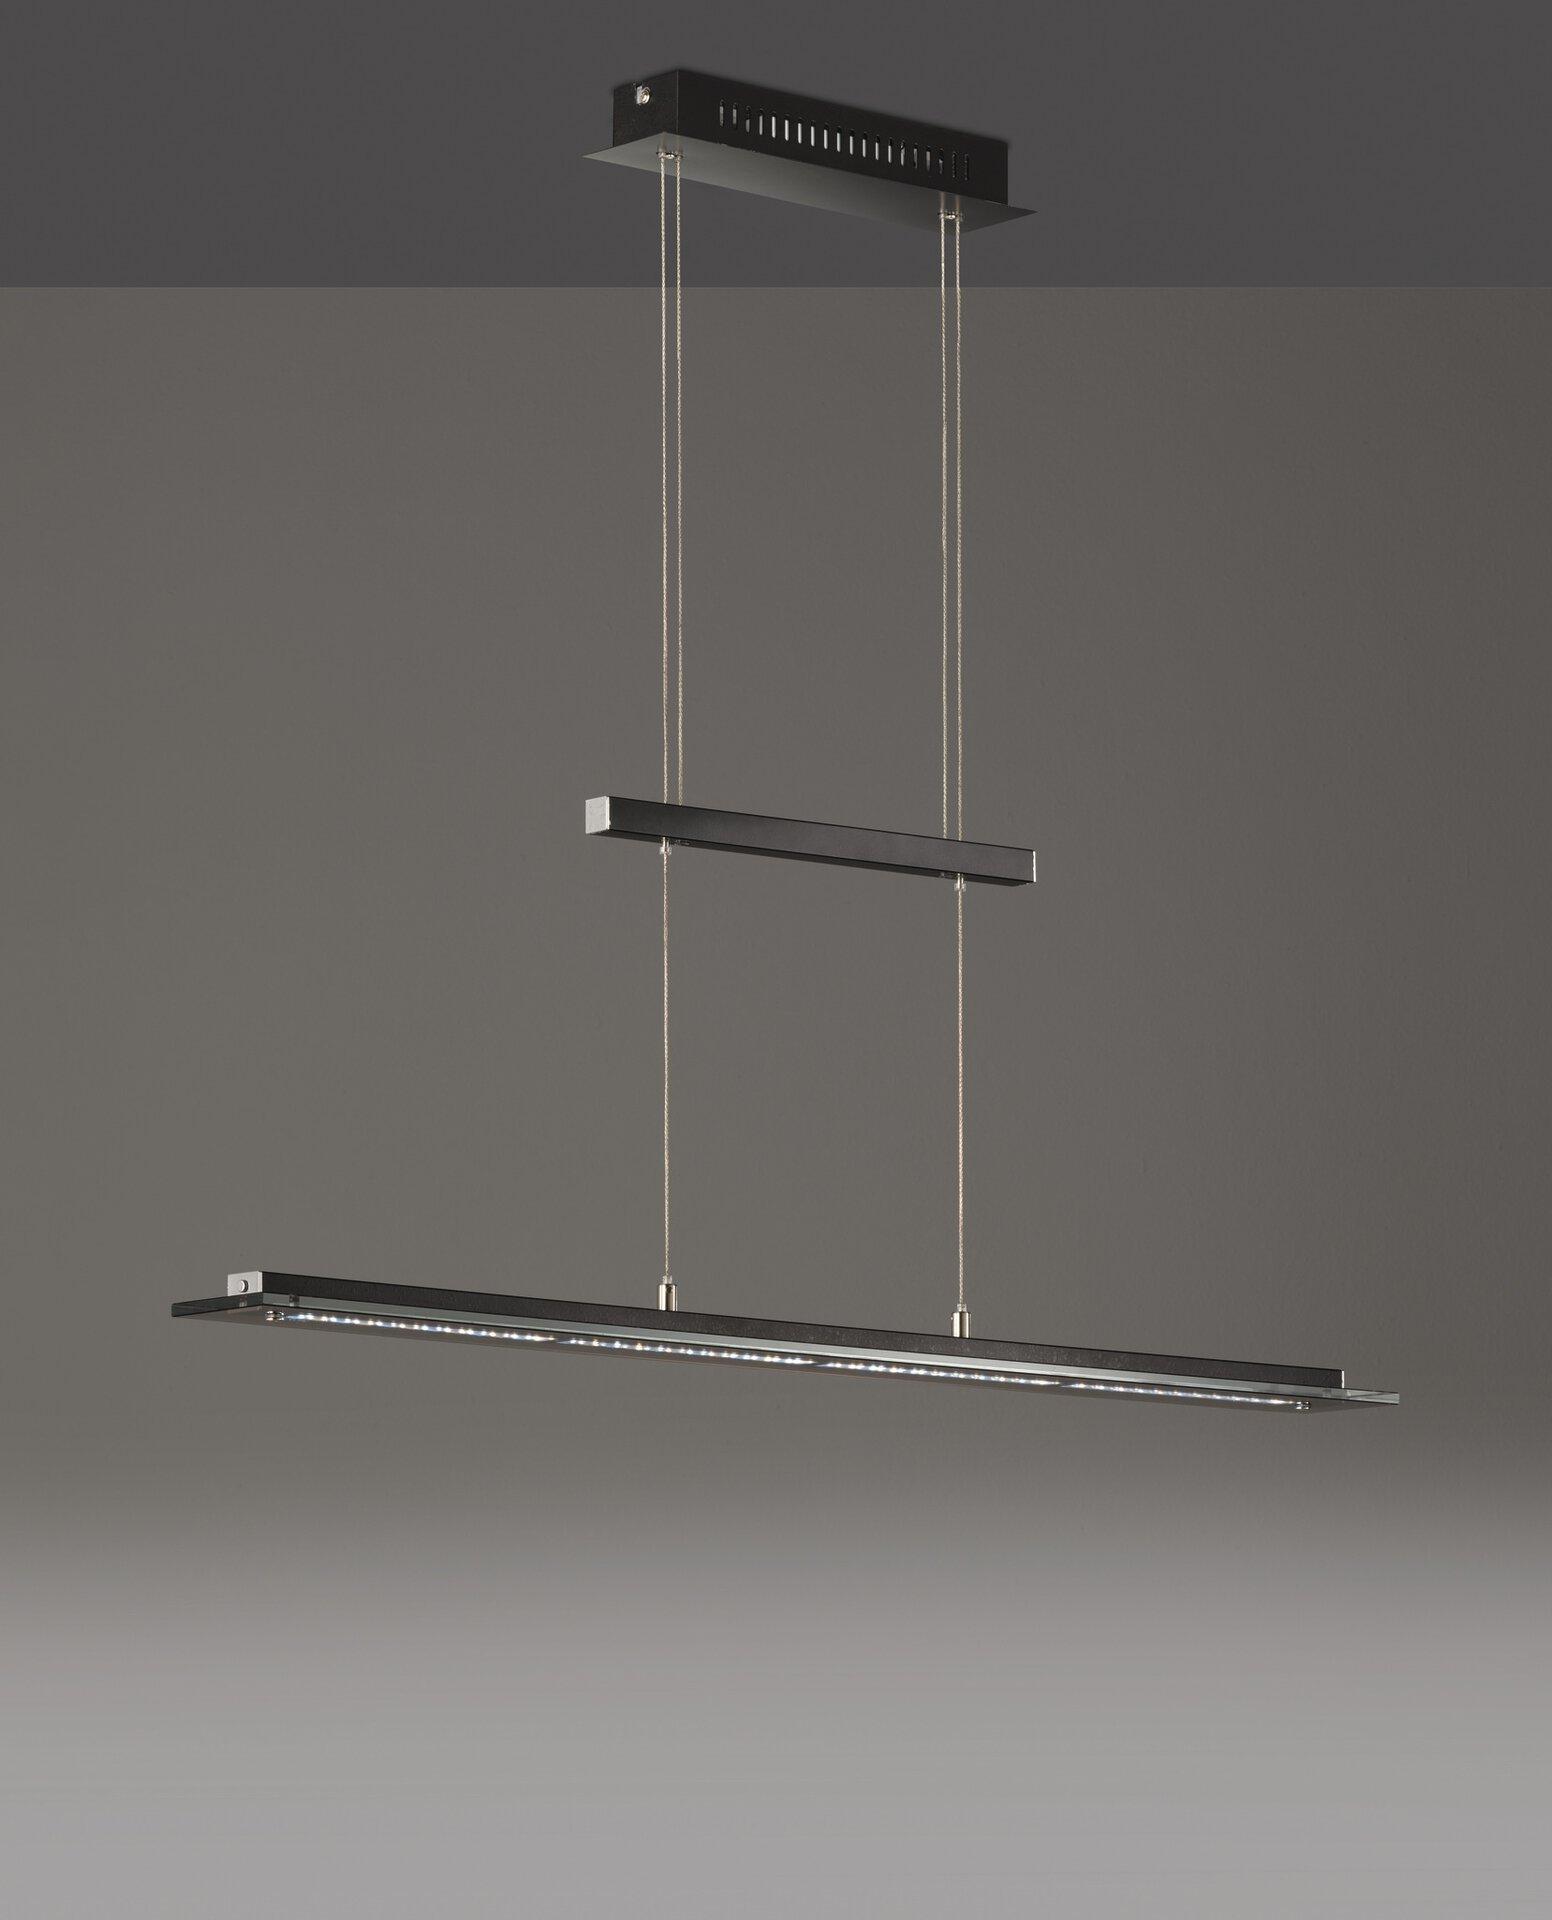 Hängeleuchte Tenso TW Fischer-Honsel Metall 9 x 150 x 88 cm